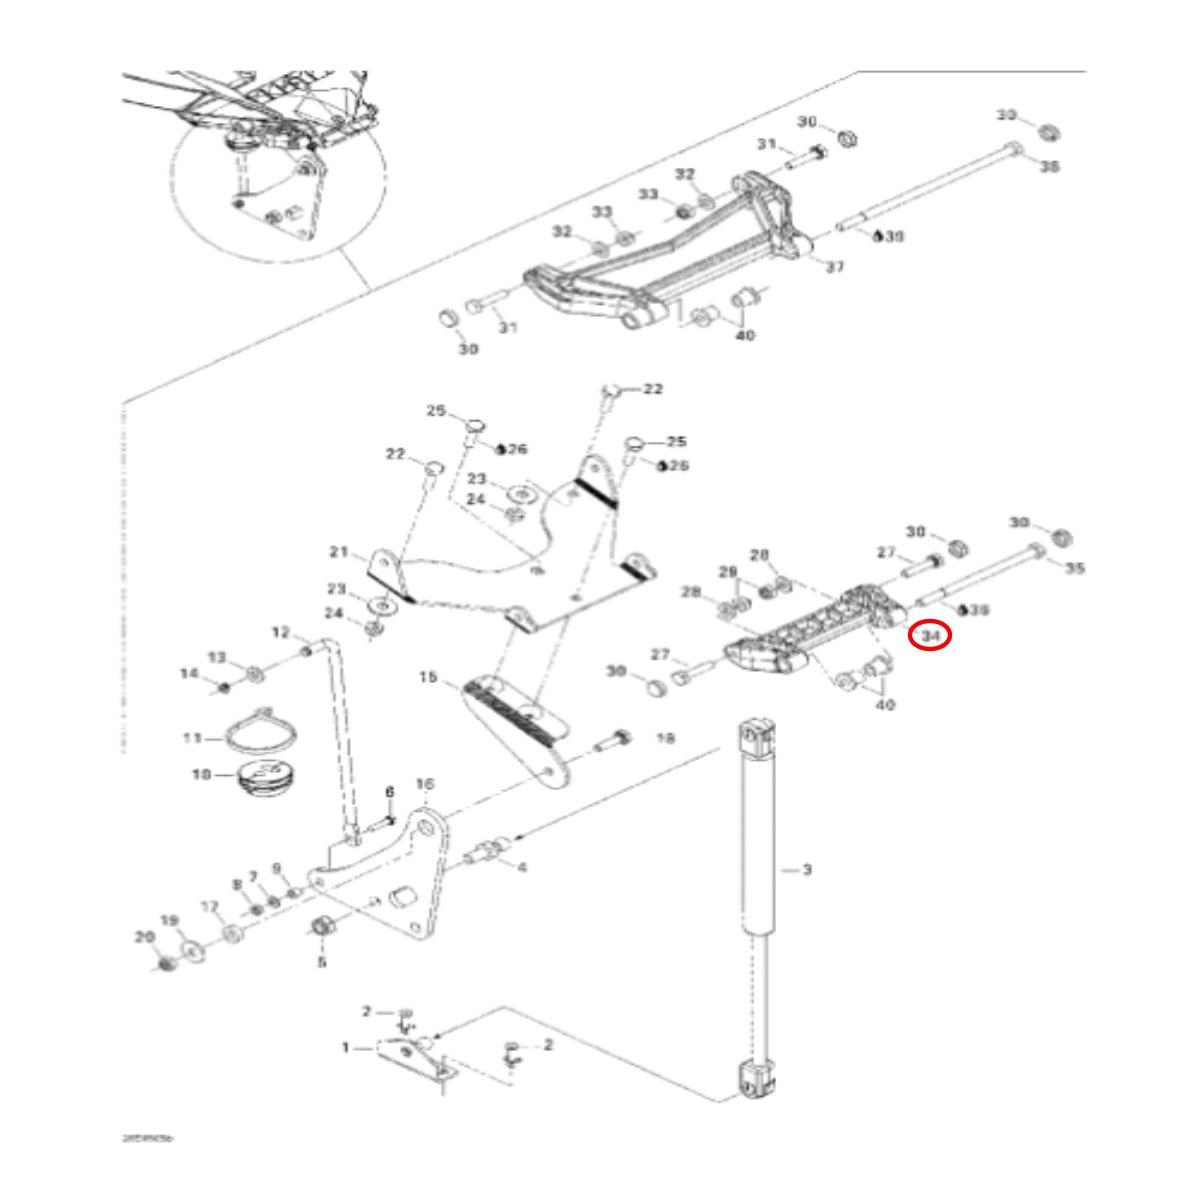 Dobradiça Tampa para Jet Ski Sea Doo GTX/RXT Pequena  - Radical Peças - Peças para Jet Ski